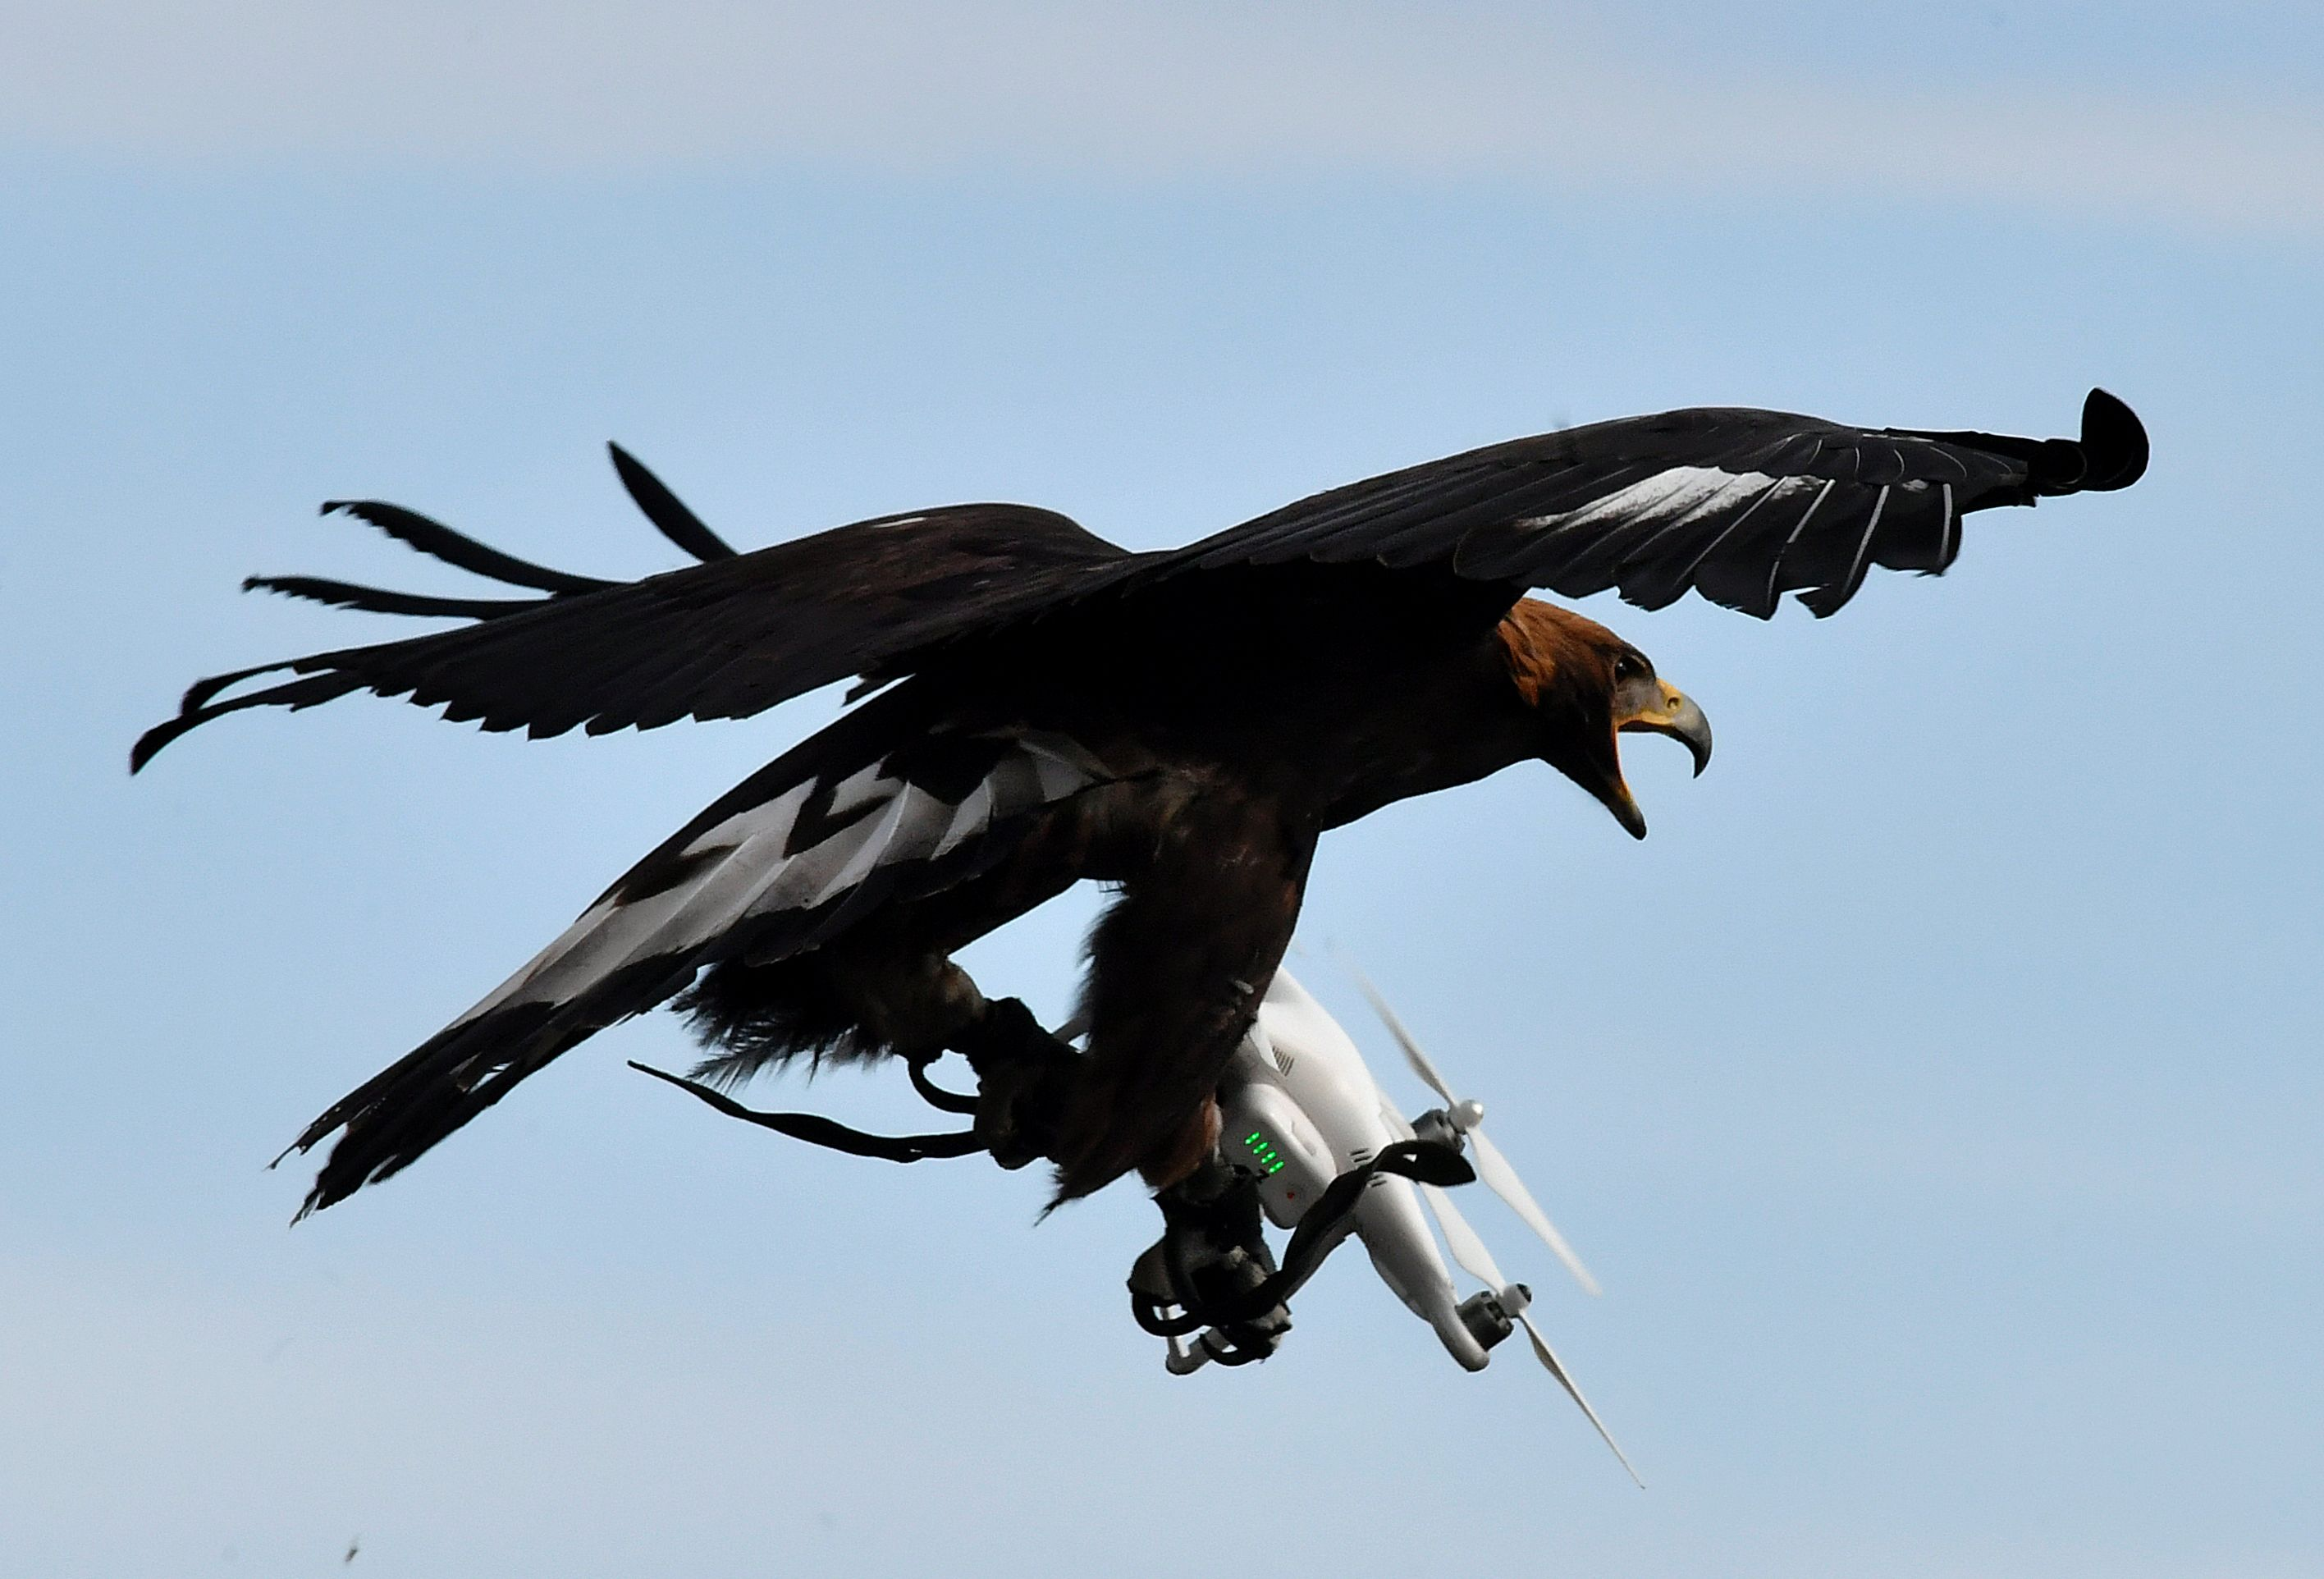 FRANCE-Drones-eagles